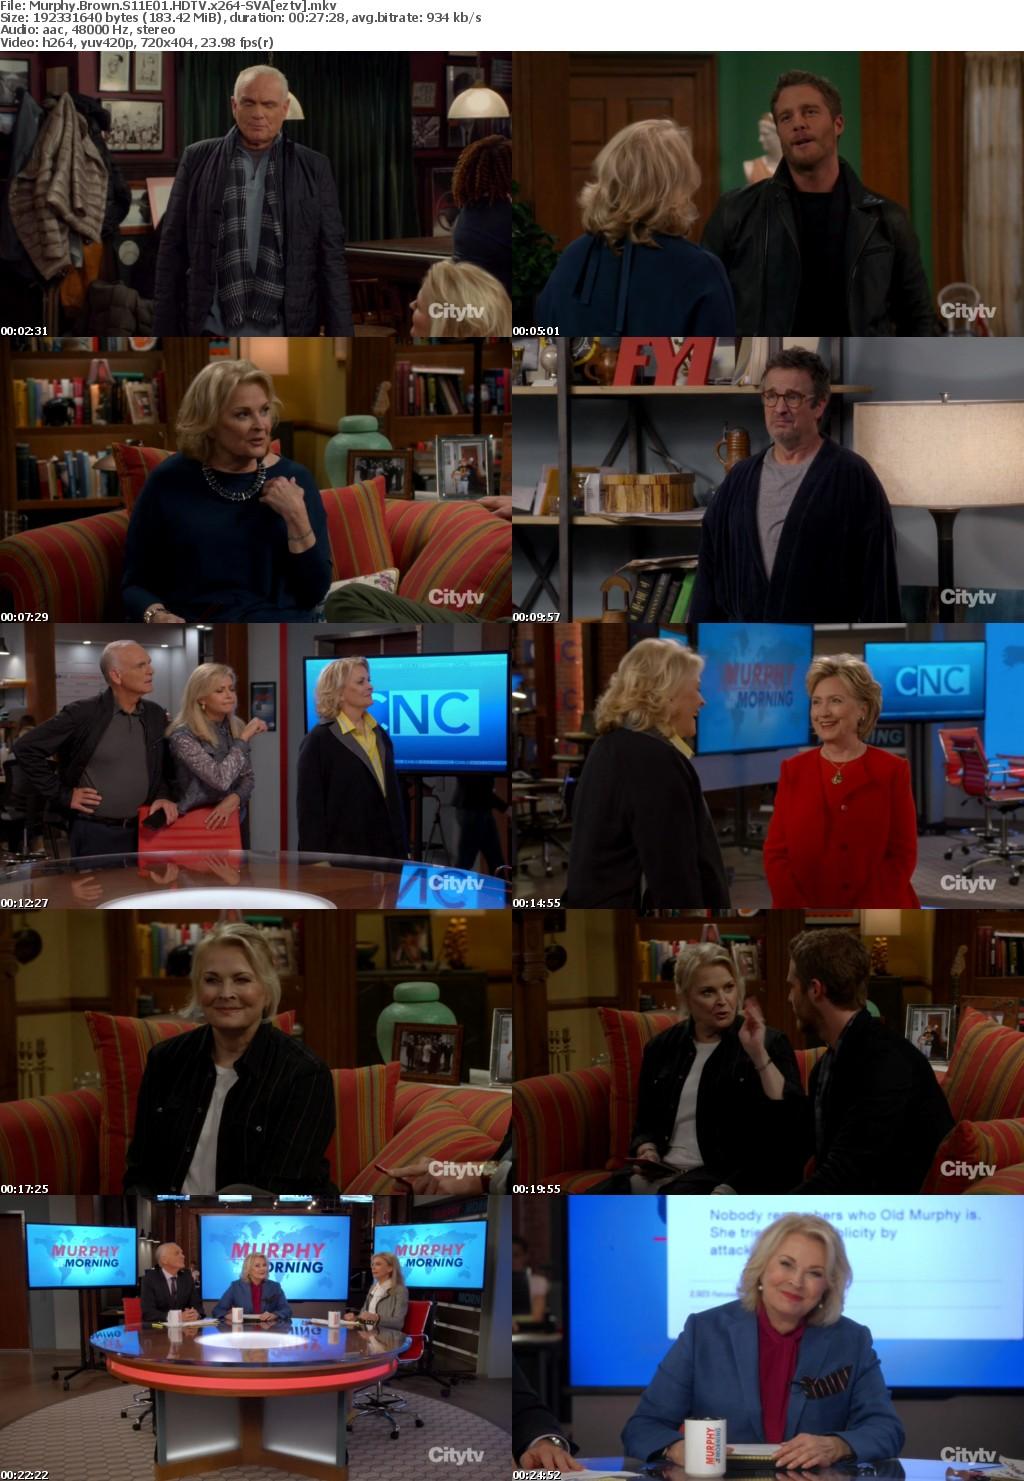 Murphy Brown S11E01 HDTV x264-SVA